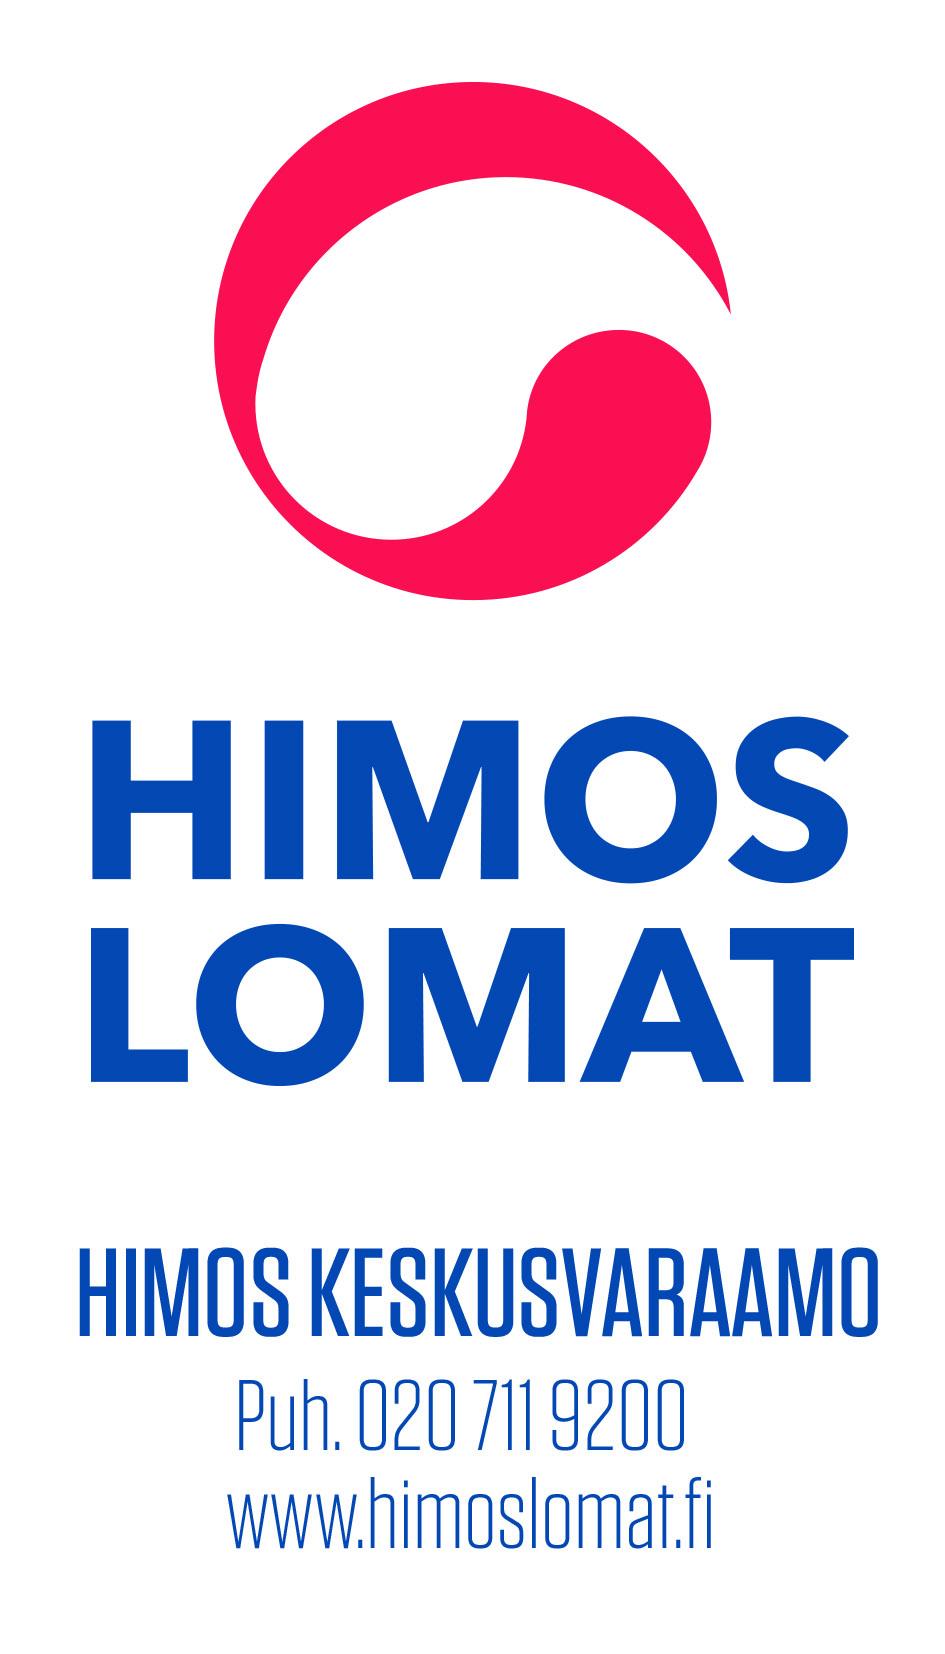 Himoslomat_keskusvaraamo.jpg